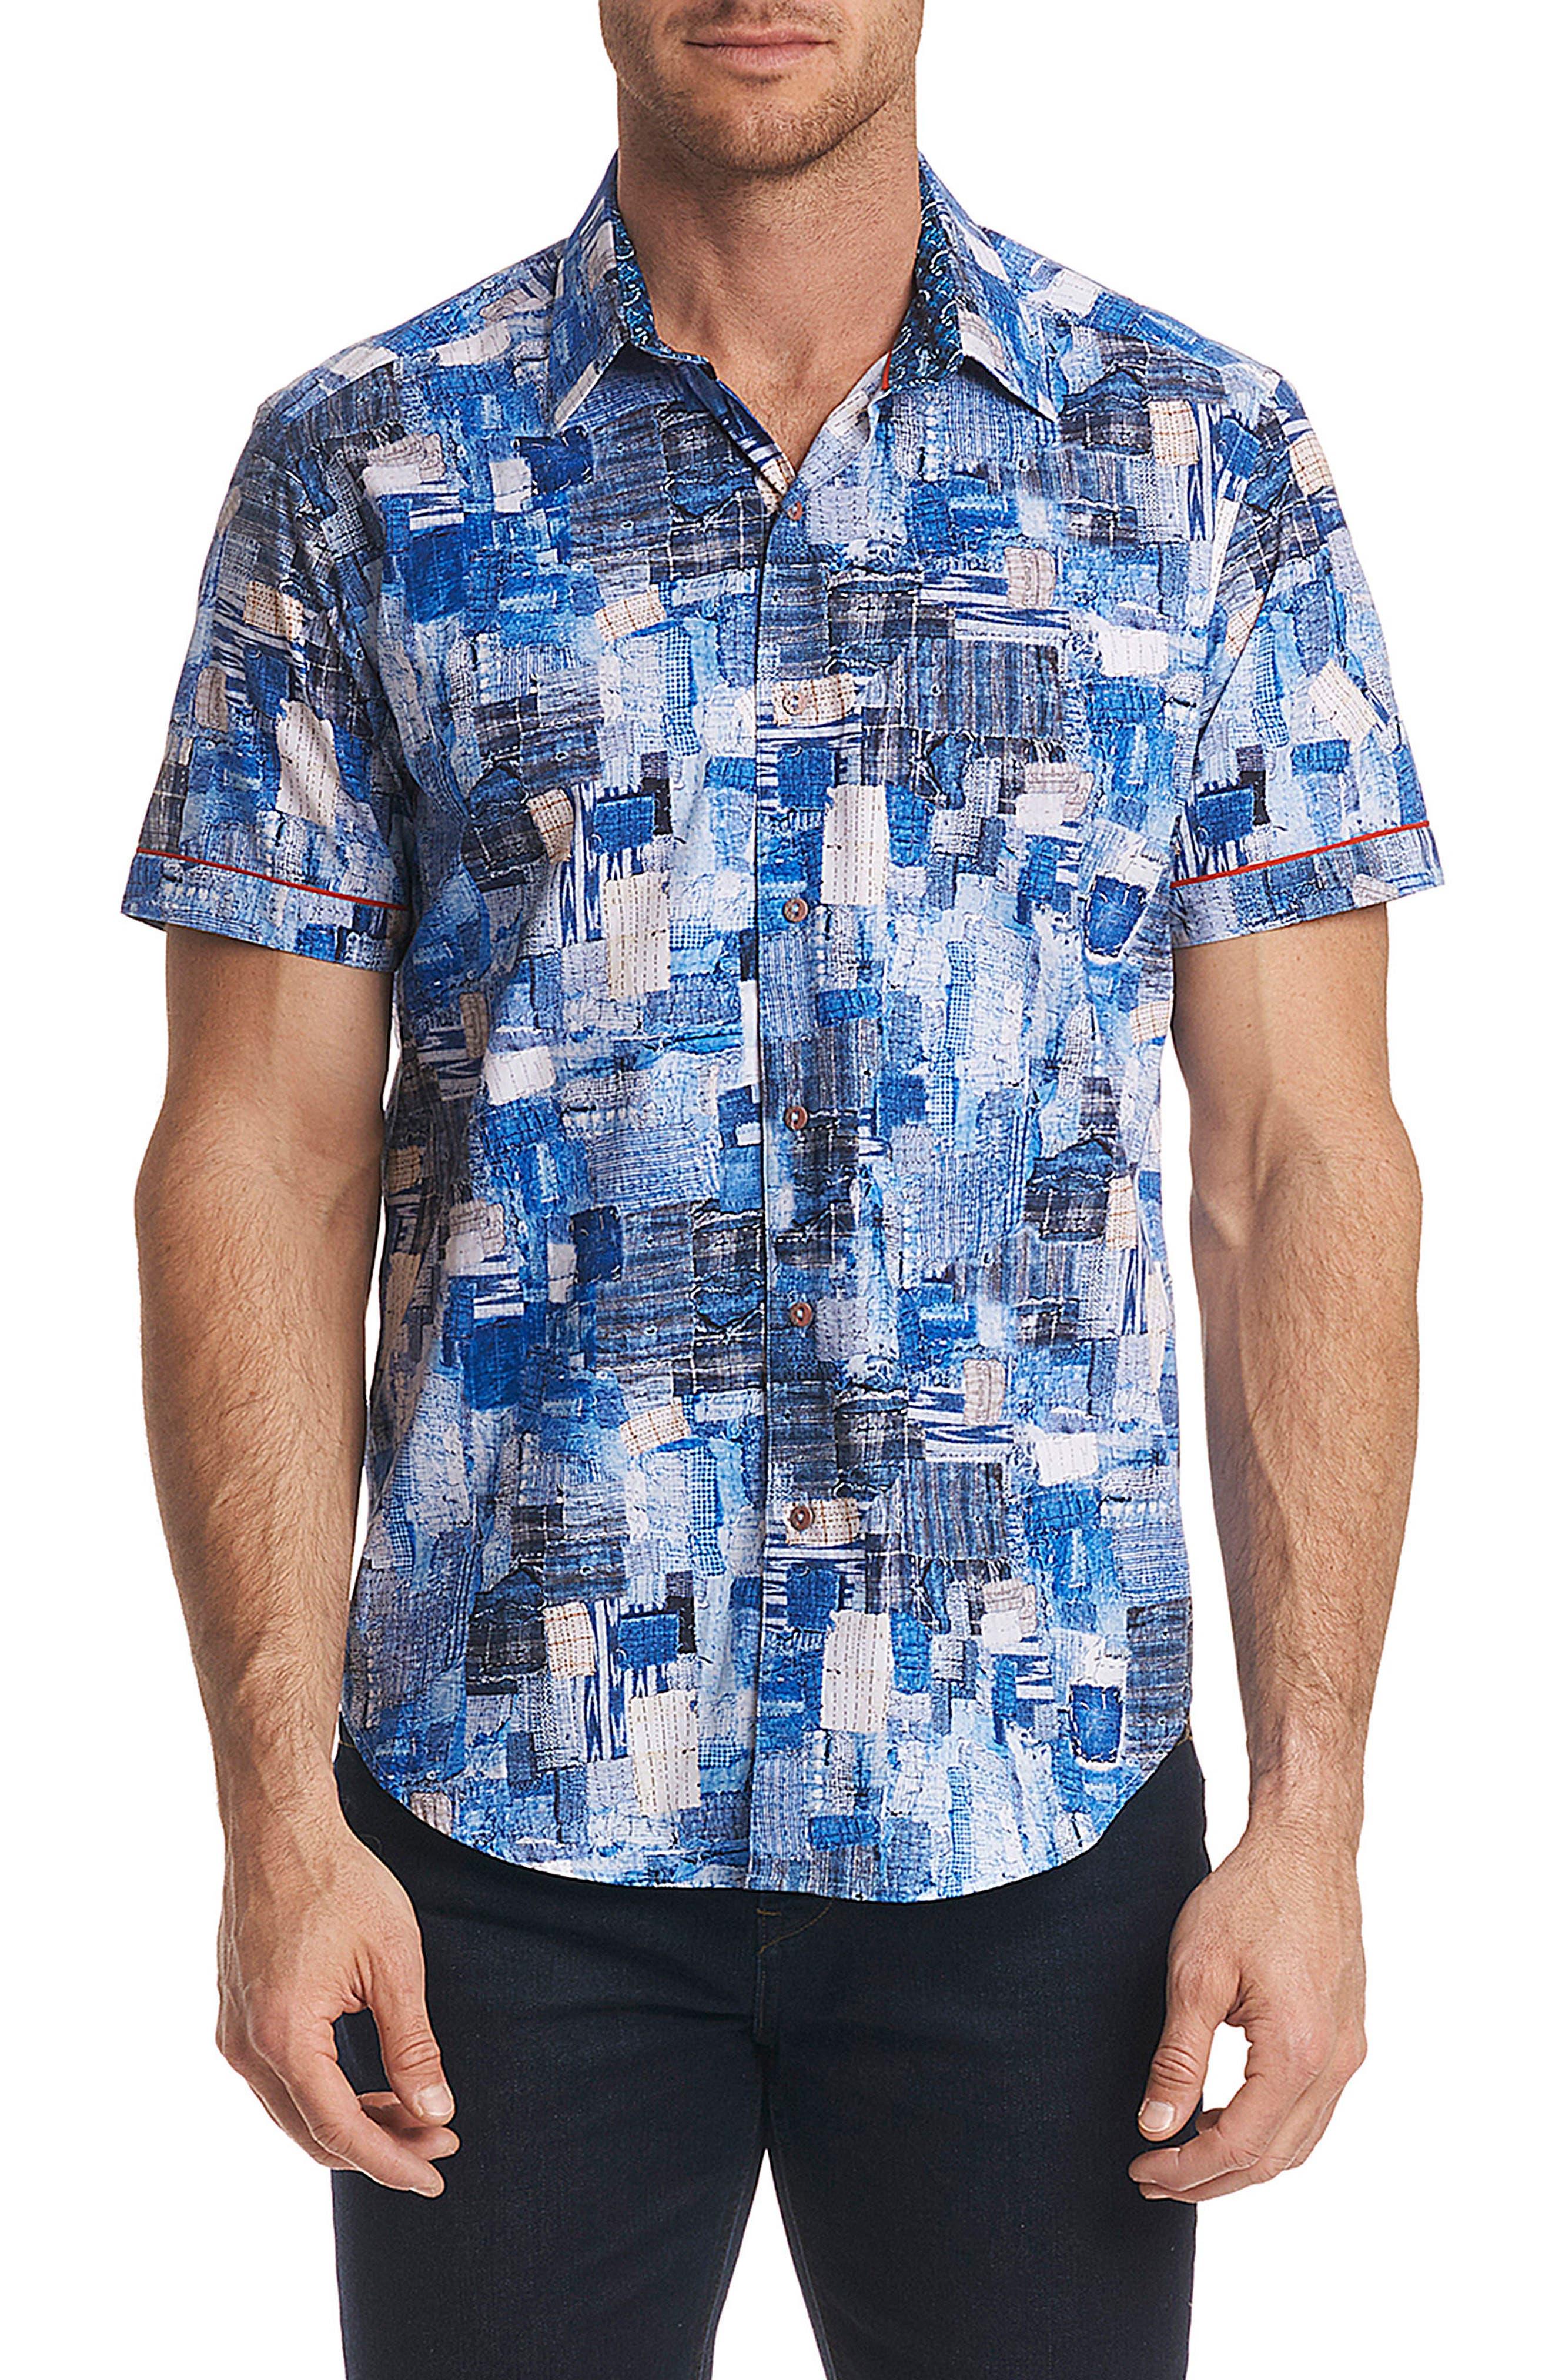 Canberra Classic Fit Sport Shirt,                             Main thumbnail 1, color,                             300